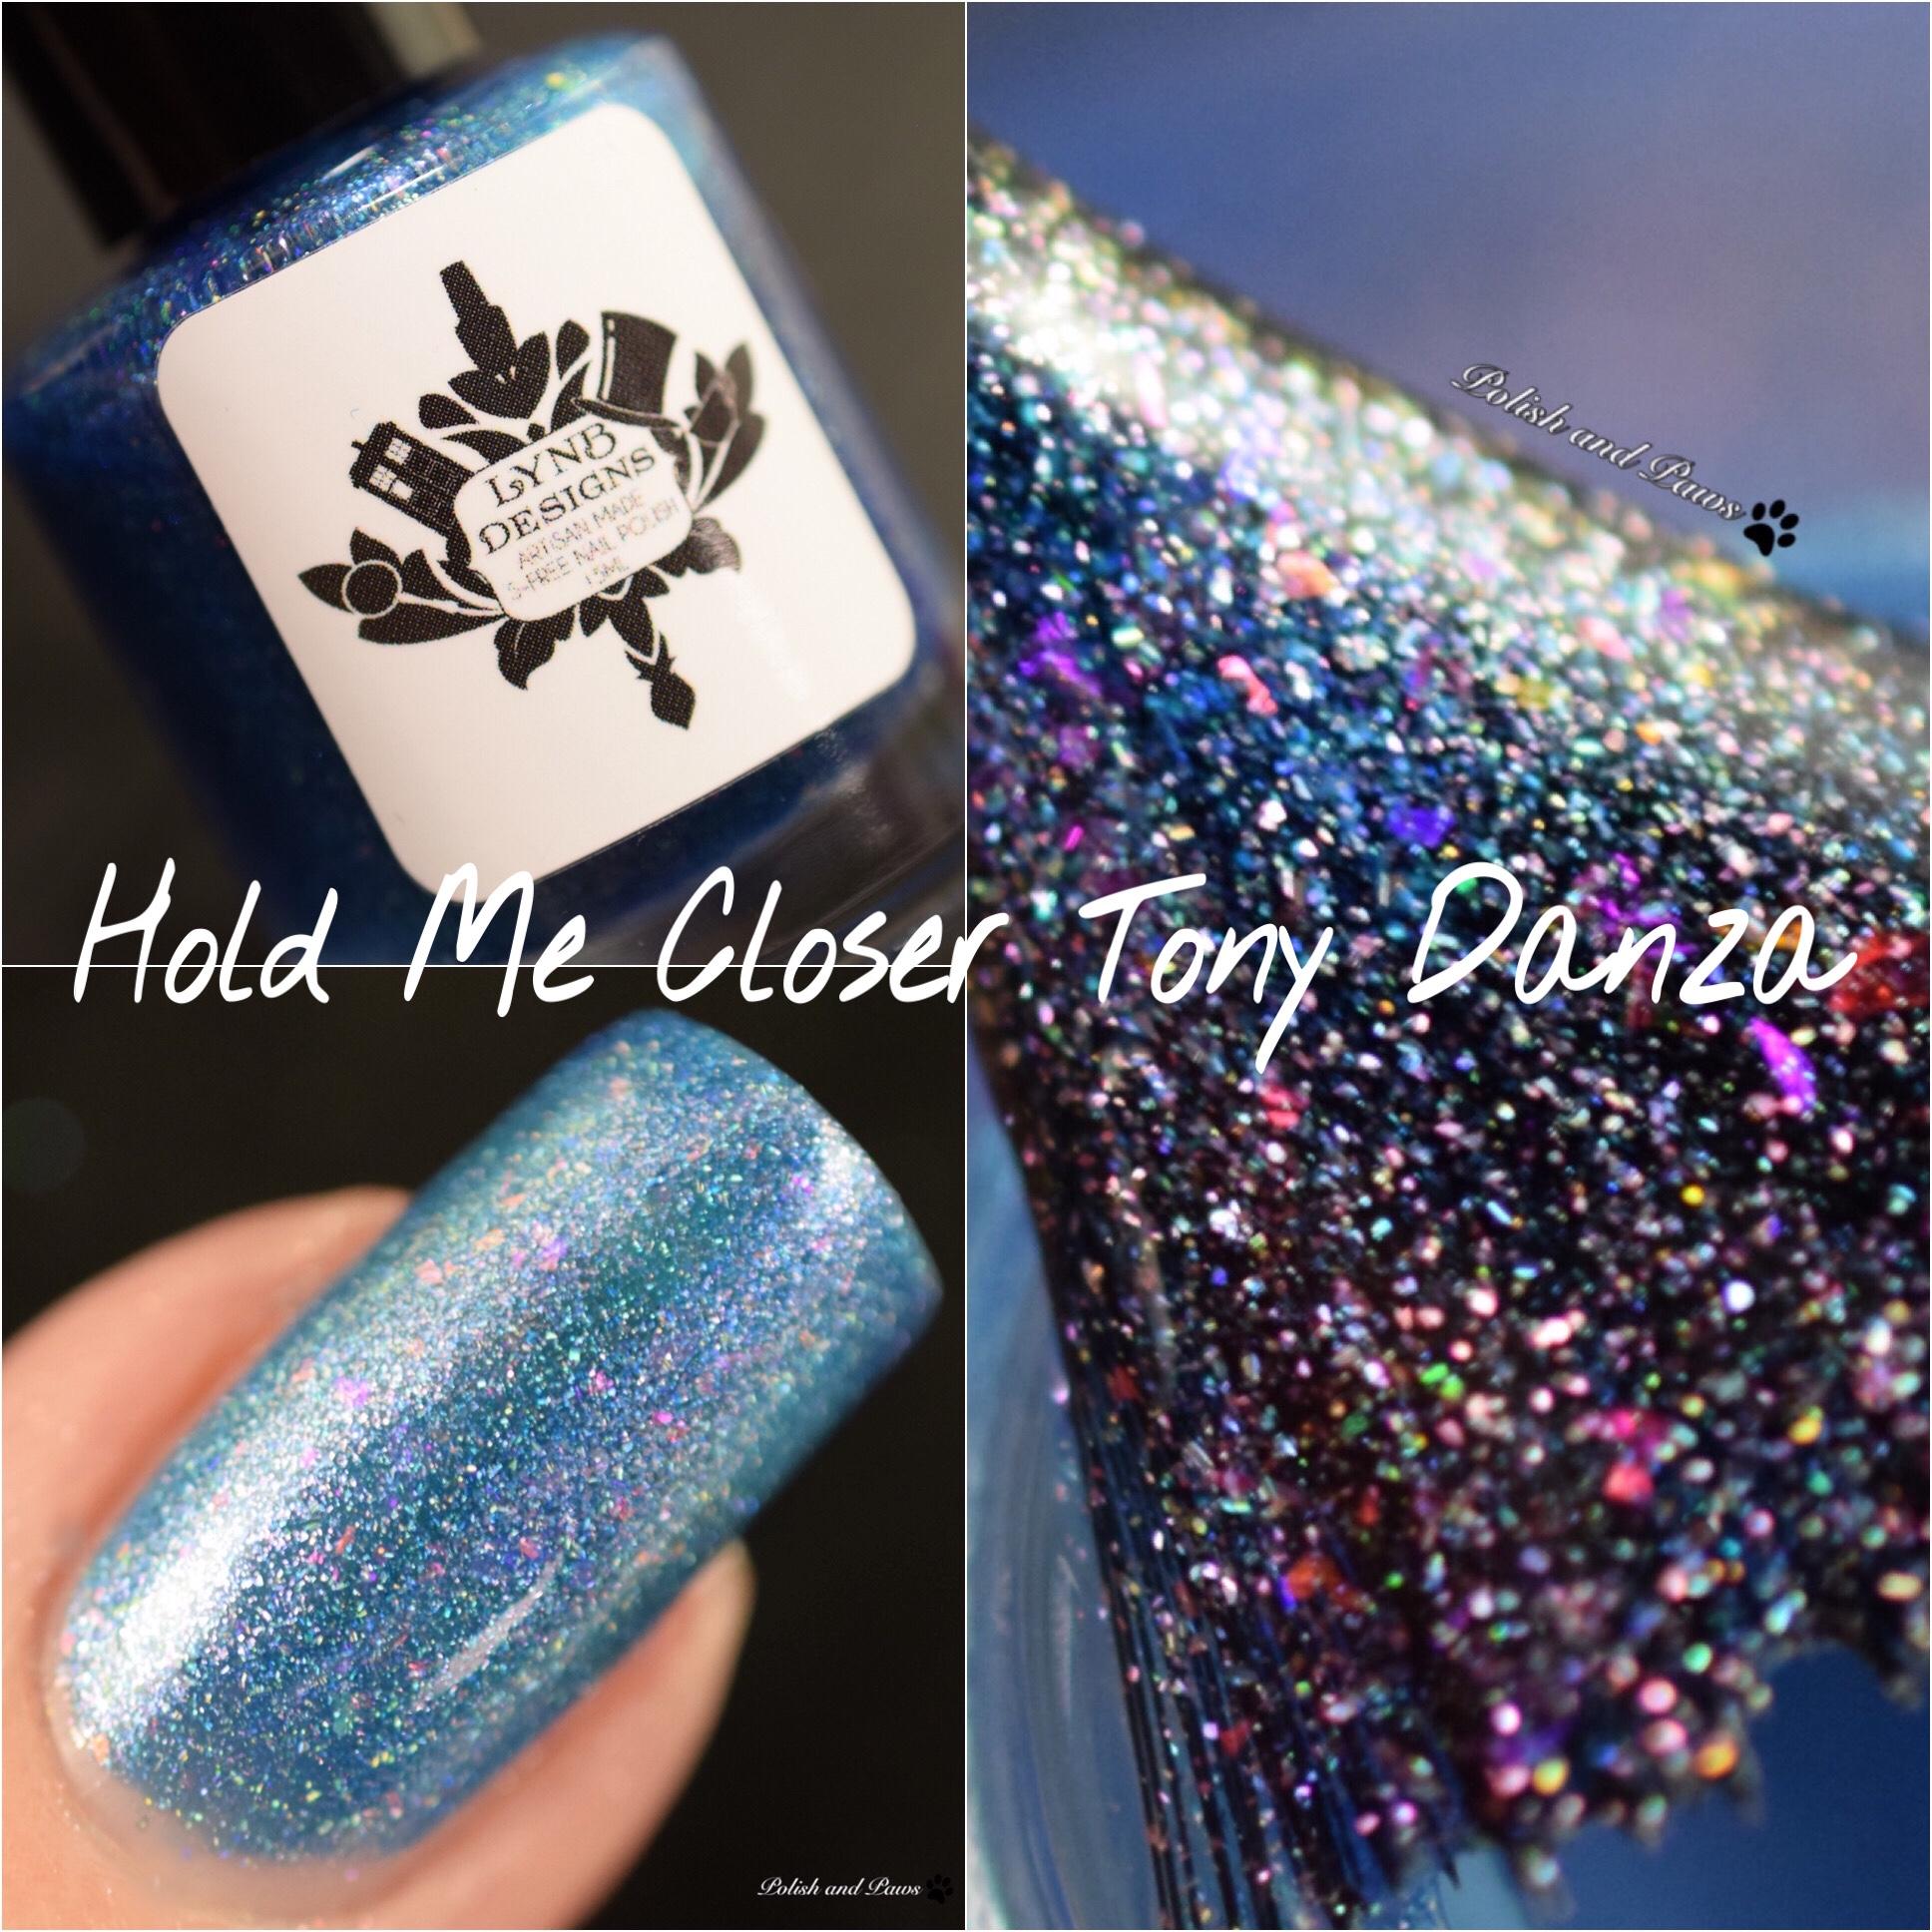 LynB Designs Hold me closer Tony Danza